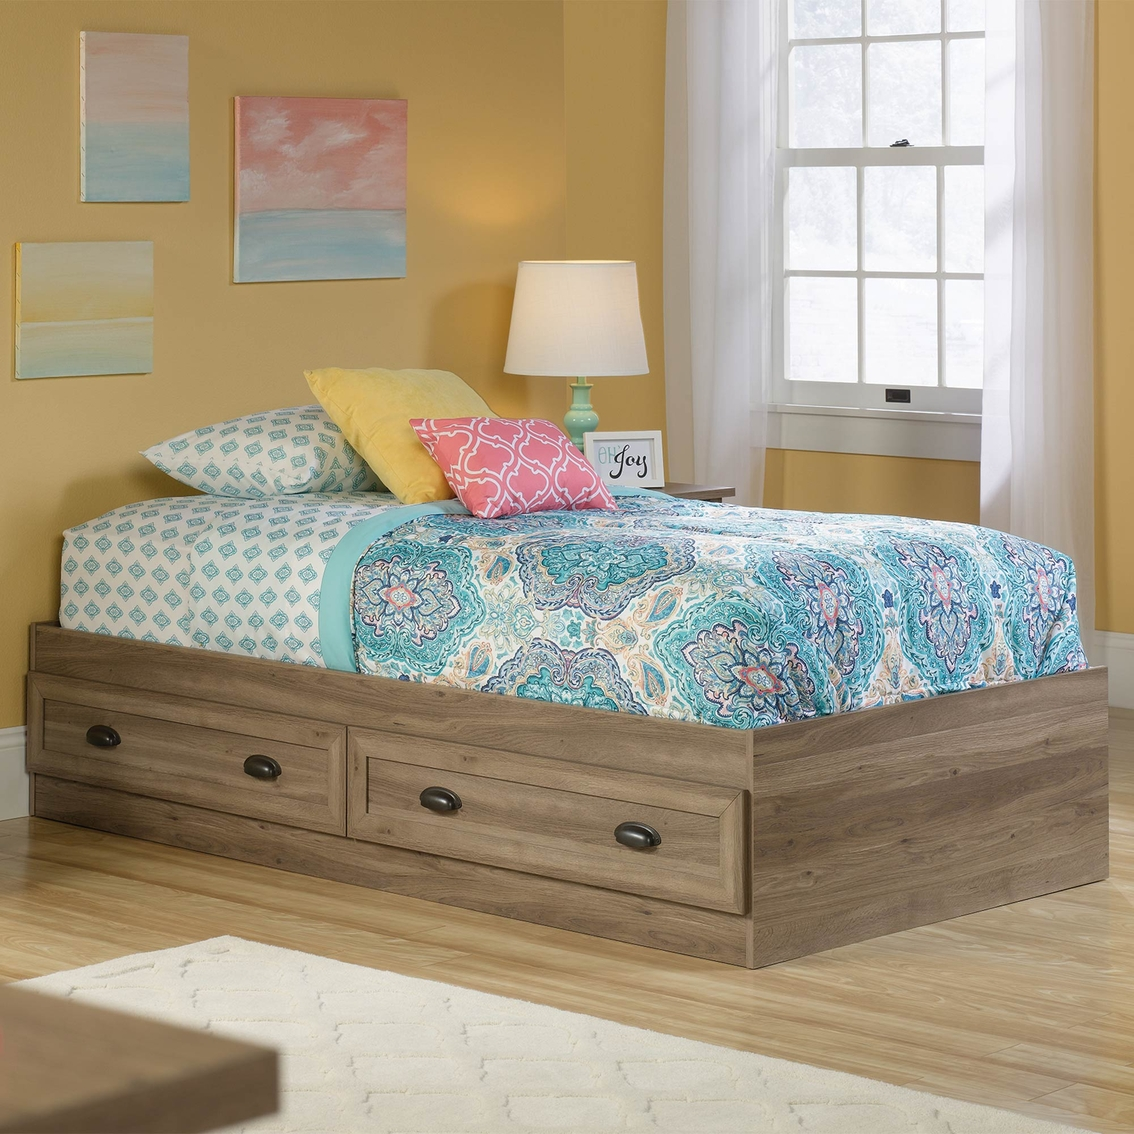 Sauder County Line Twin Platform Bed | Beds | Home ...